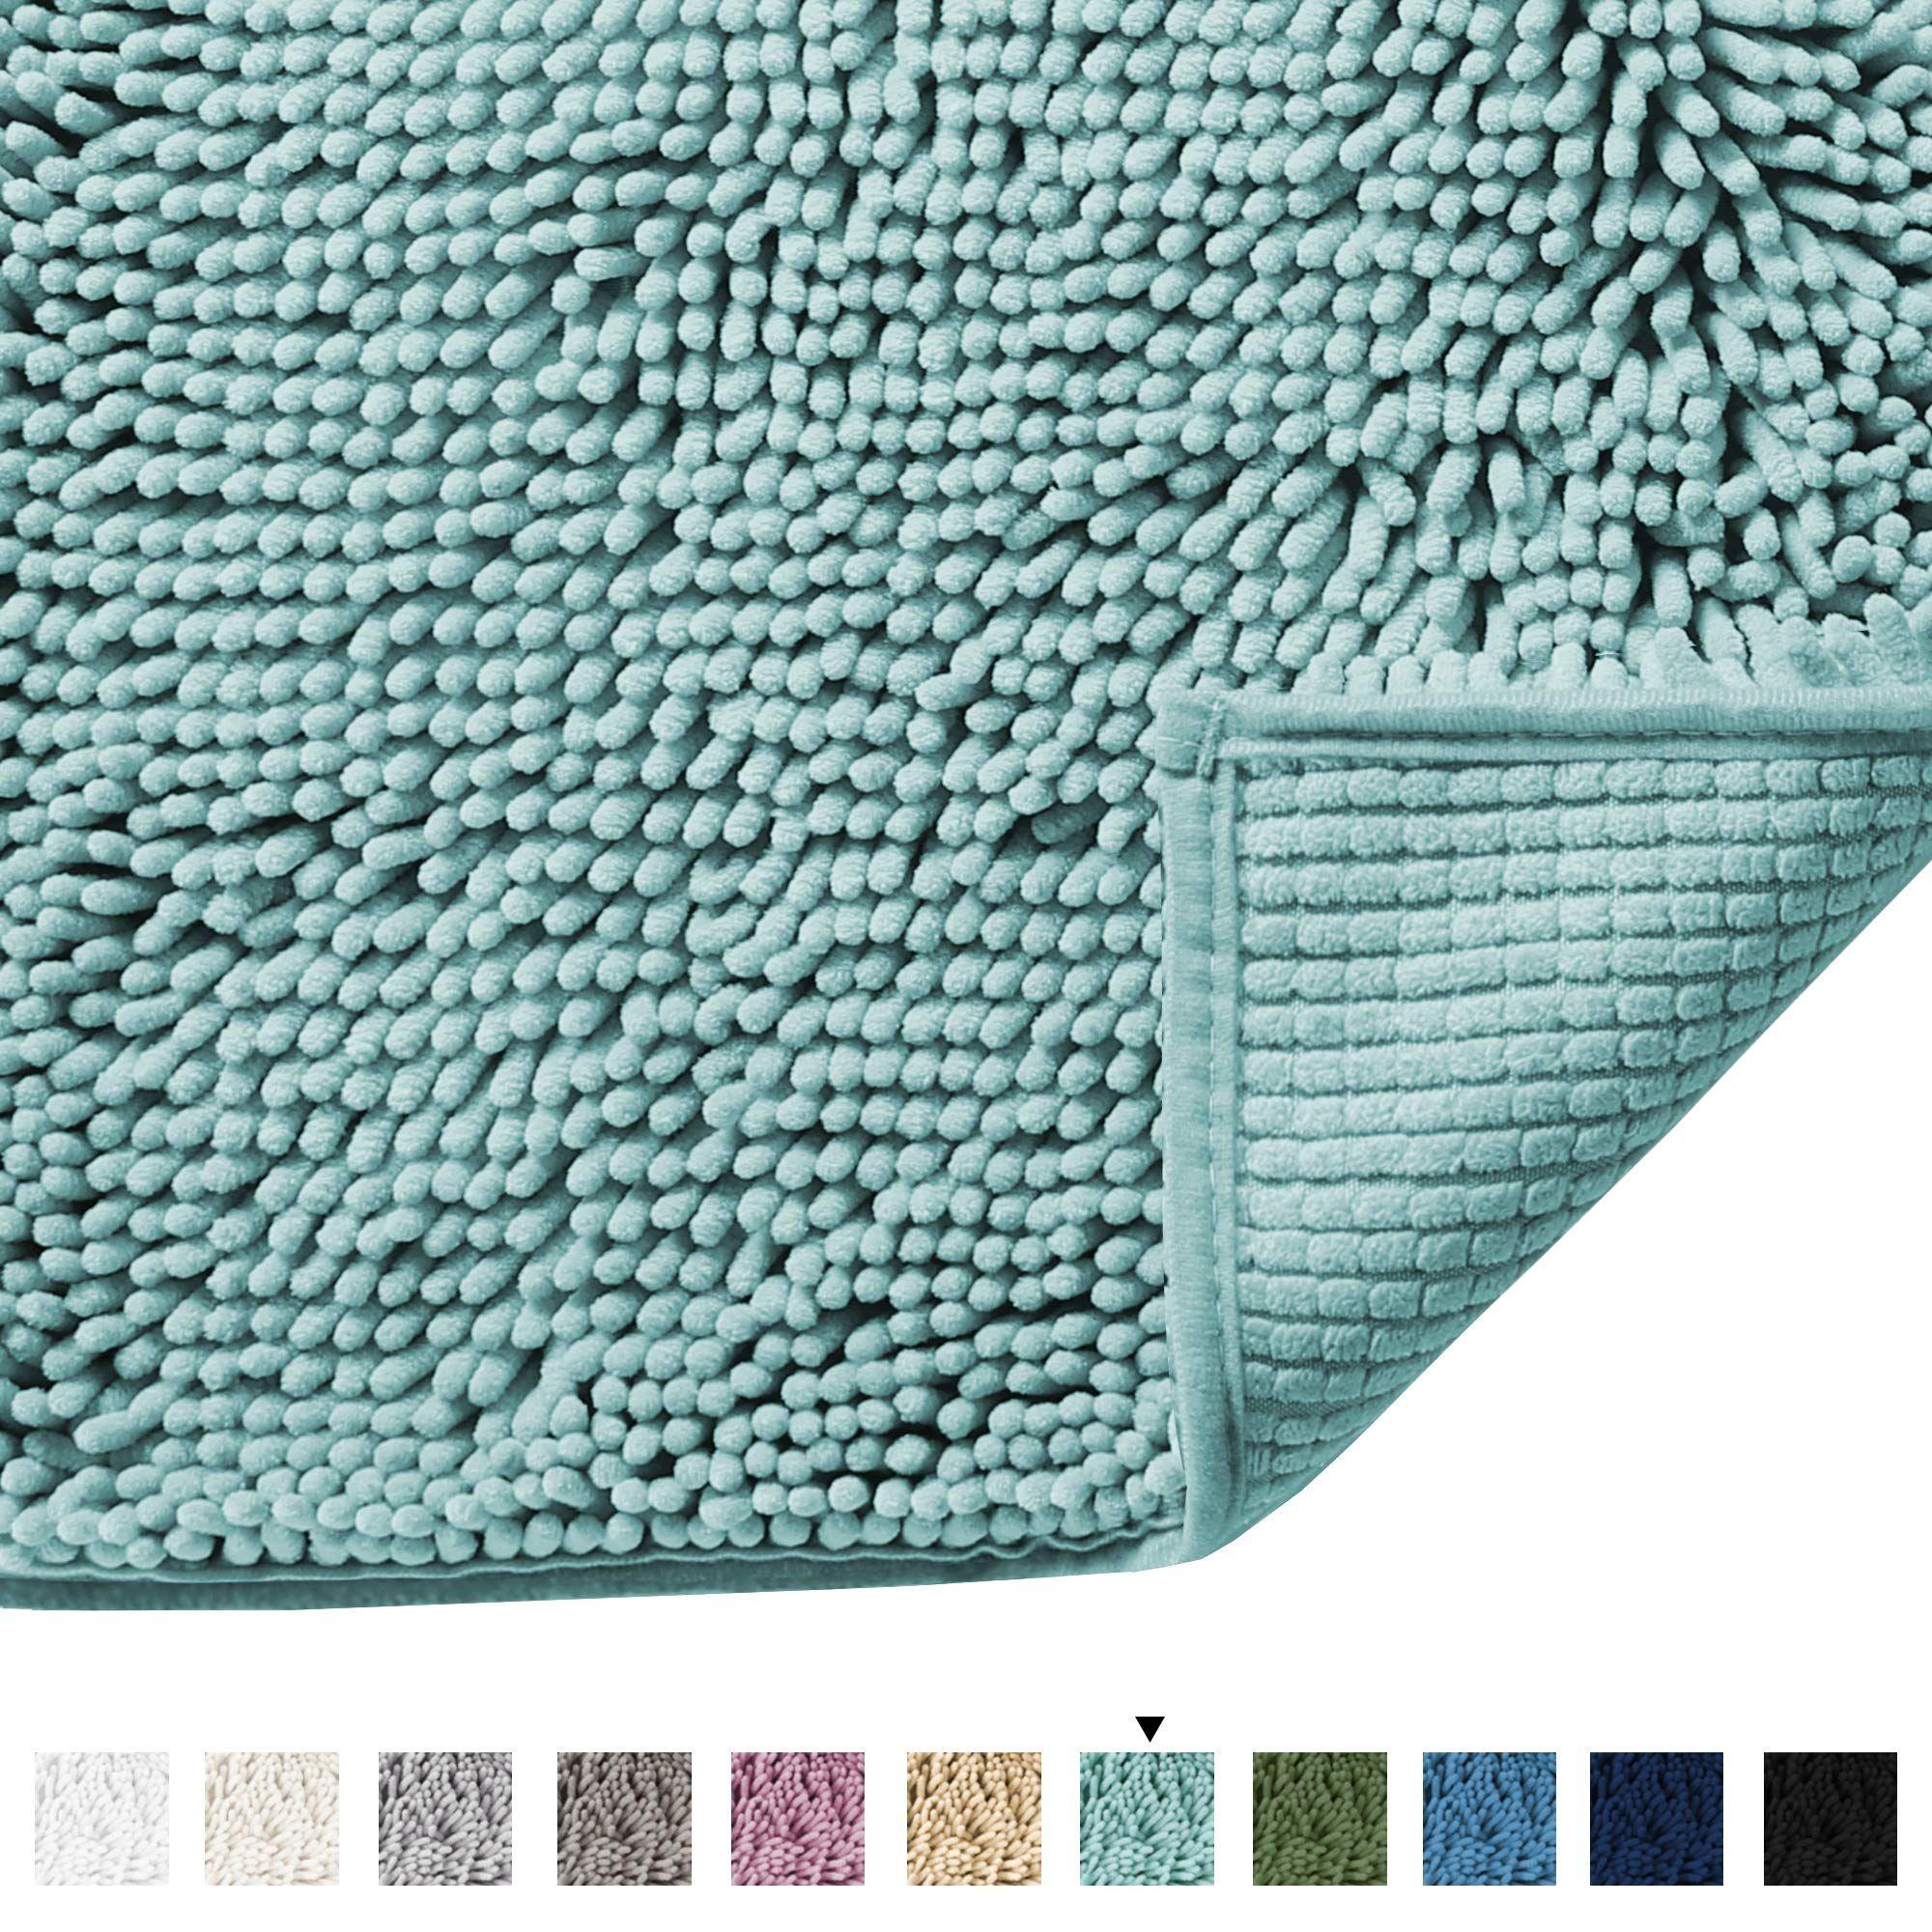 Microfiber Bath Rugs Chenille Floor Mat Ultra Soft Washable Bathroom Dry Fast Water Absorbent Bedroom Area Rugs 17 X 24 I In 2020 Plush Bath Rugs Floor Rugs Diy Rug